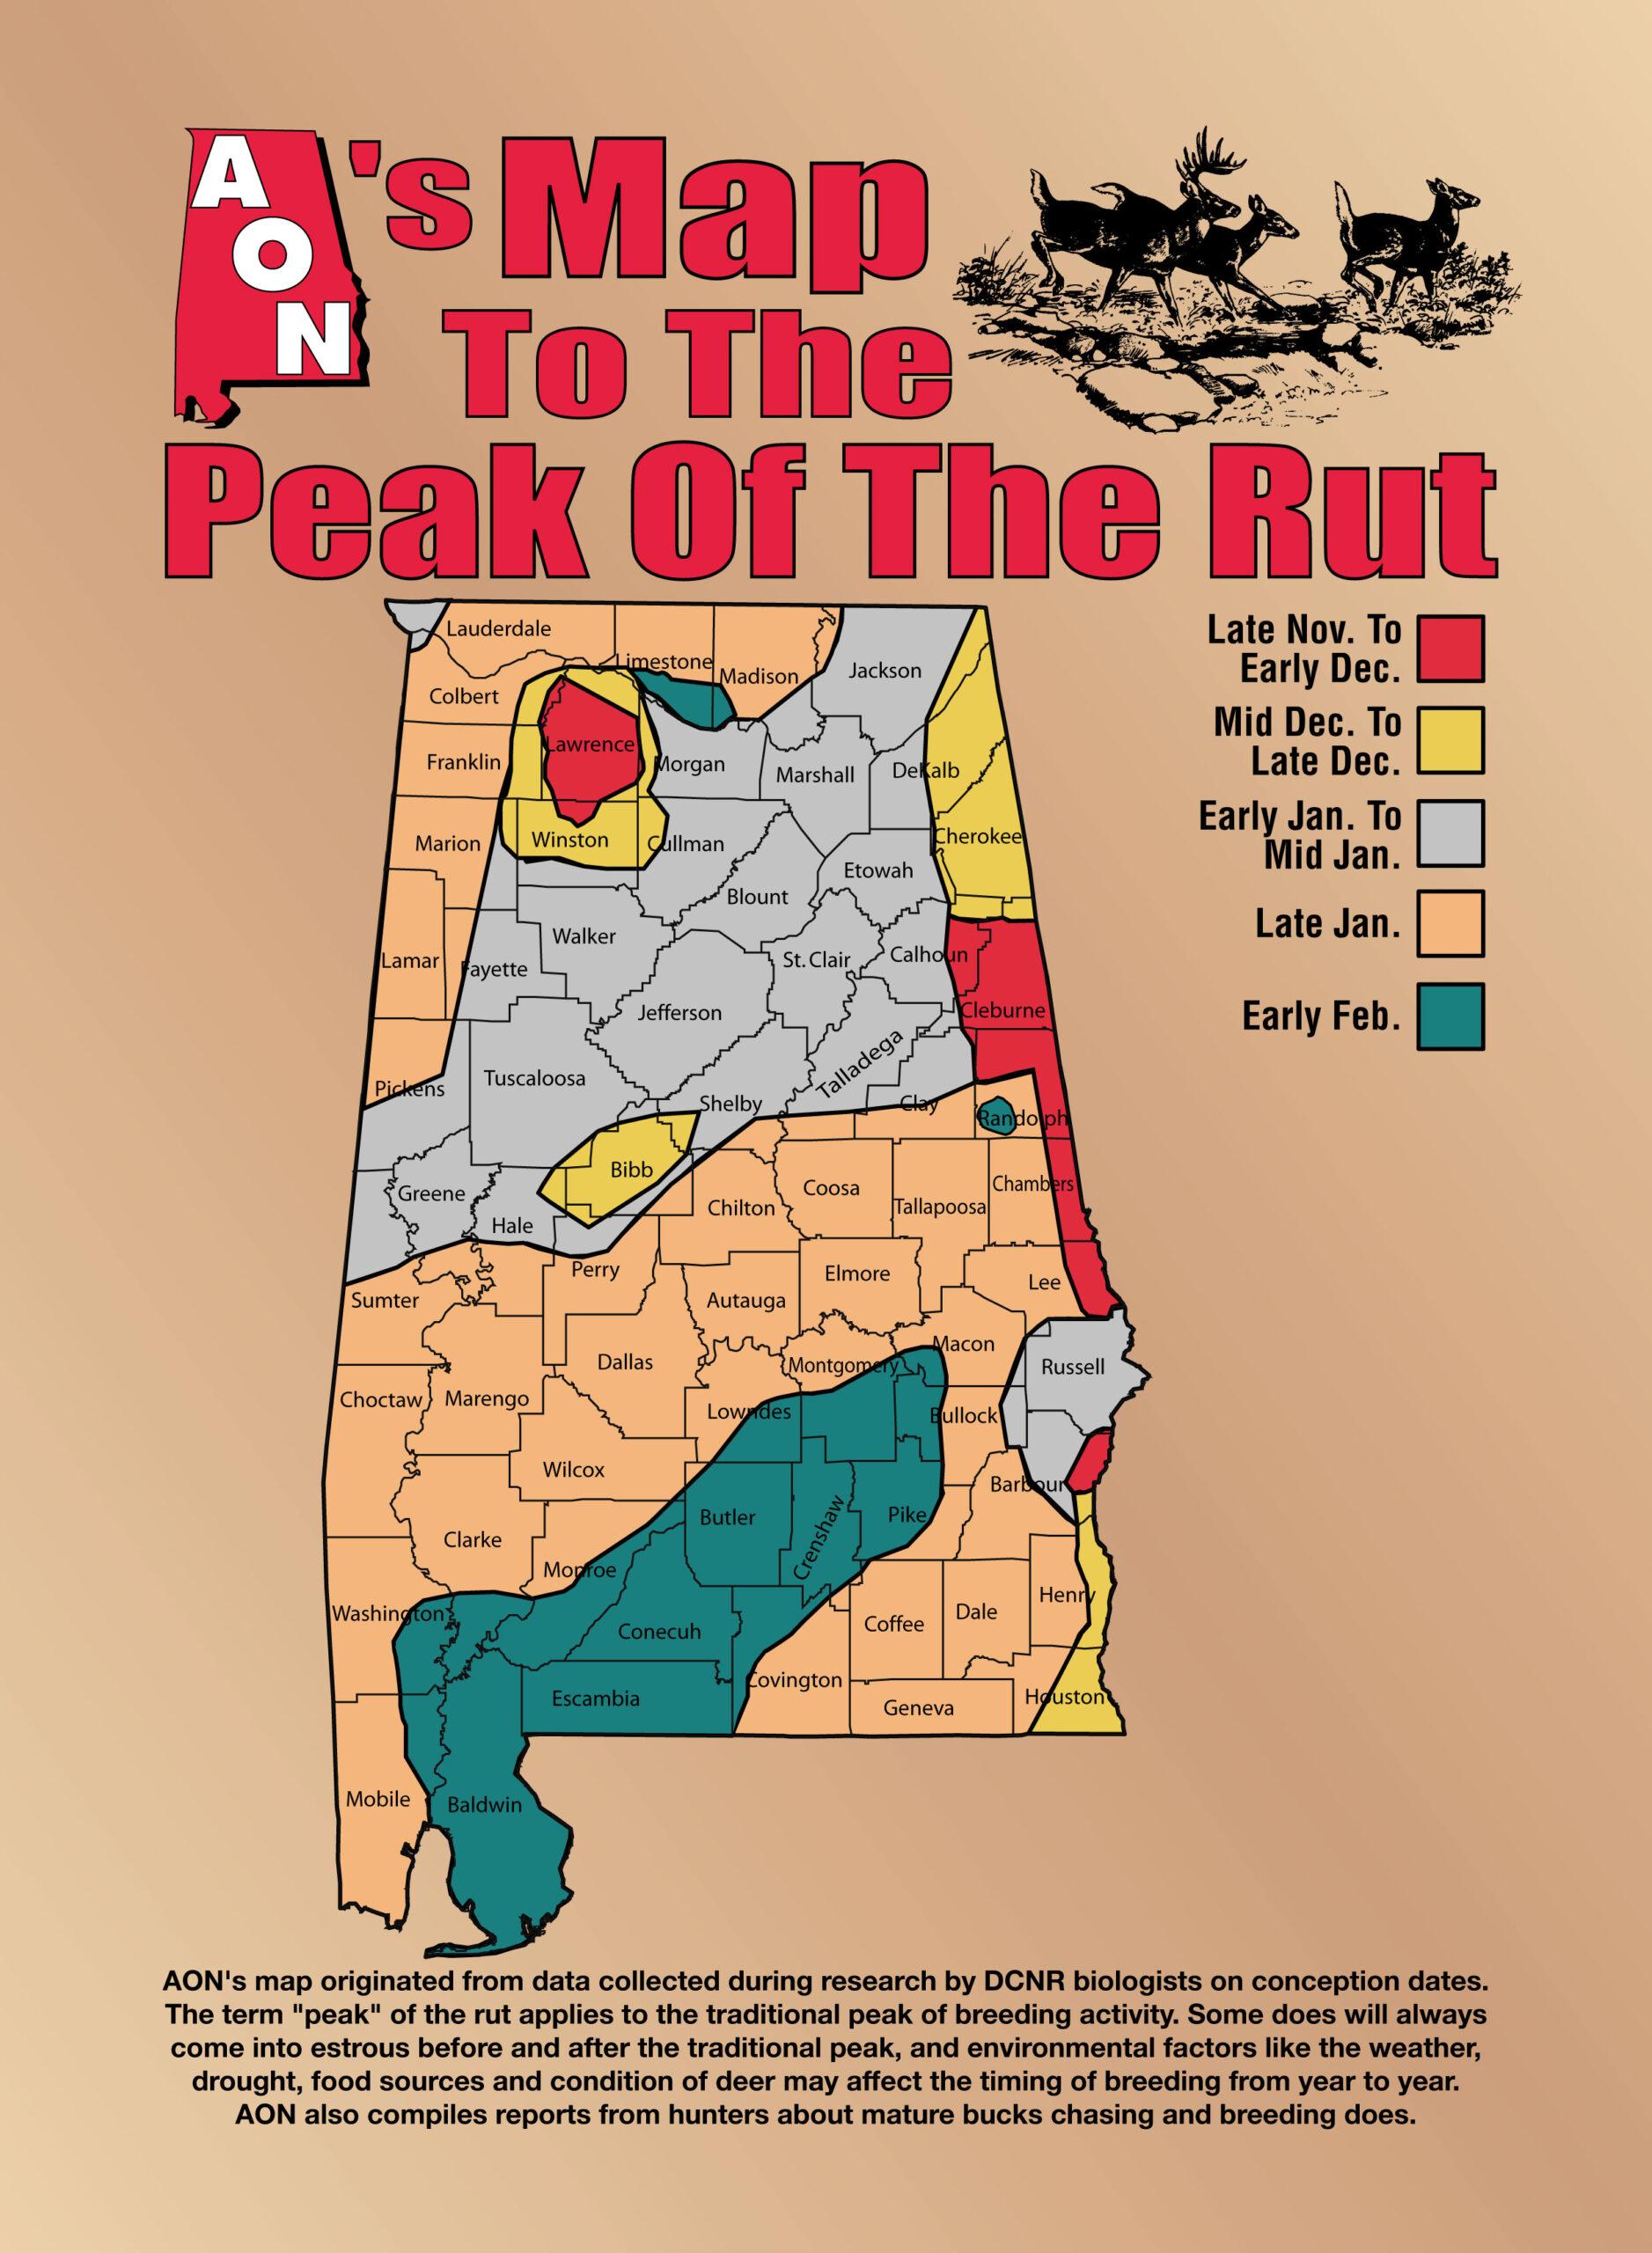 Decoding The Rut intended for Deer Rut Calendar 2021